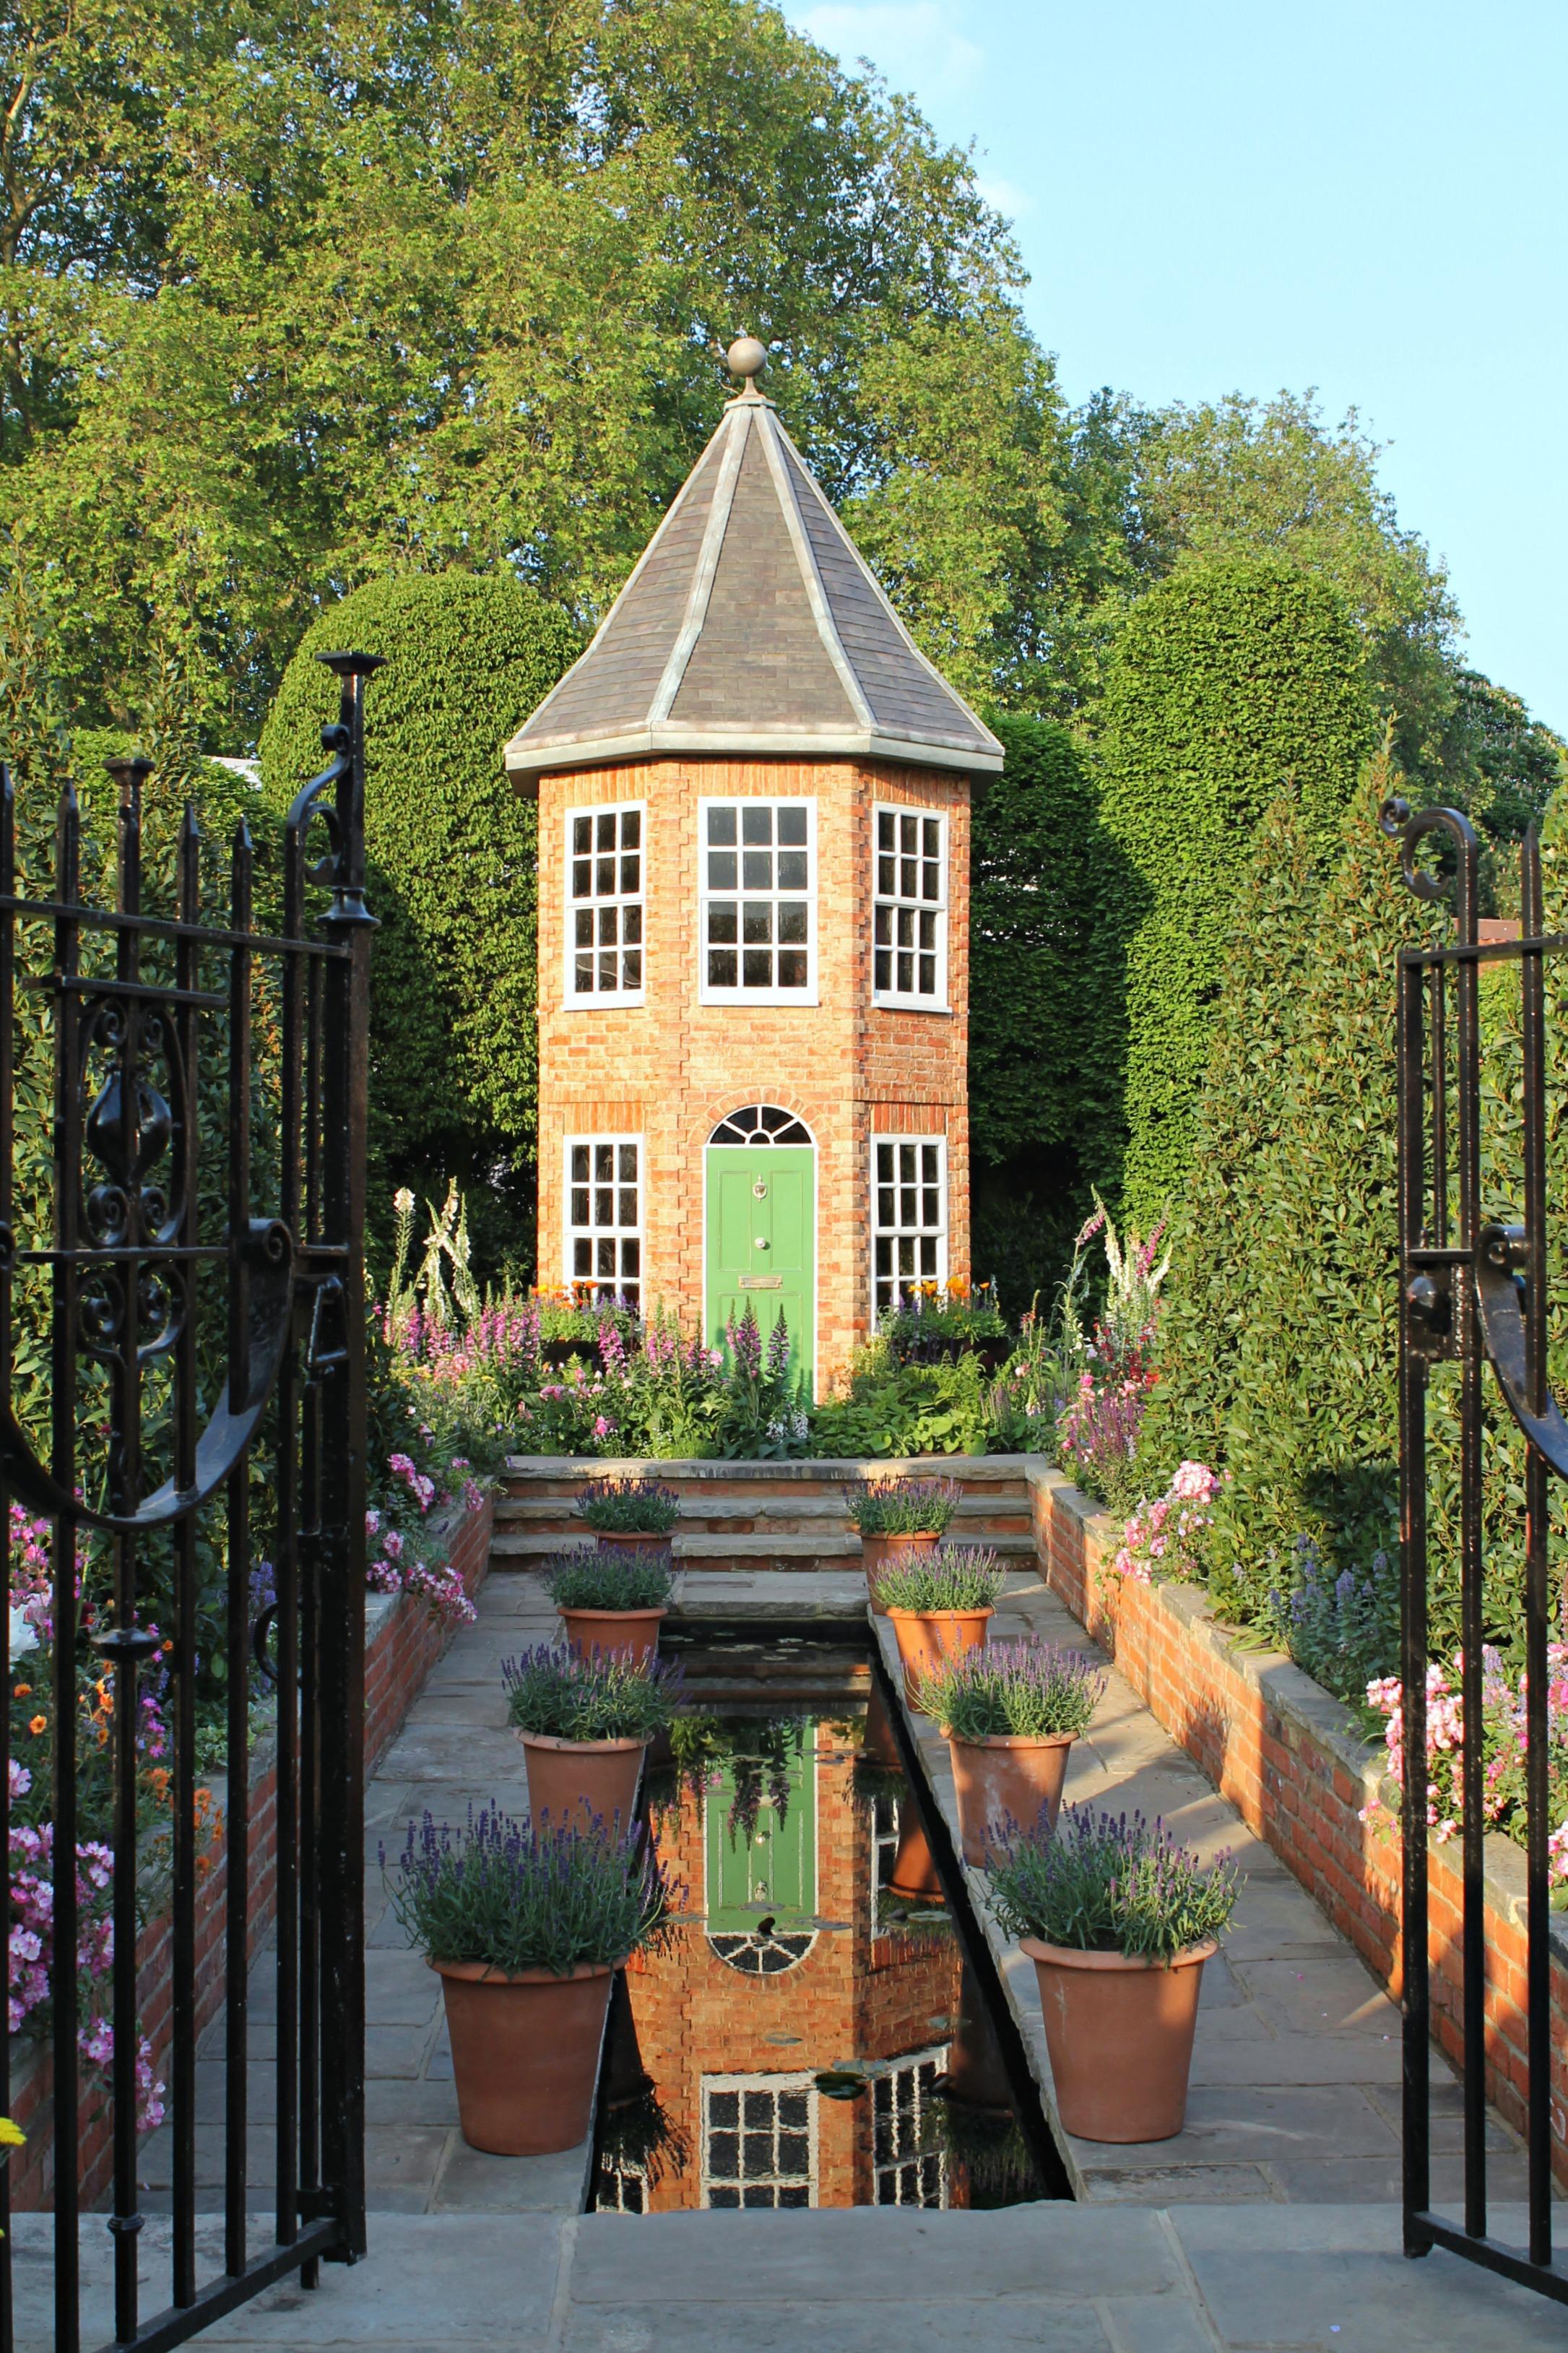 Harrods-garden-Chelsea-Flower-show-photo-by-Little-Big-Bell